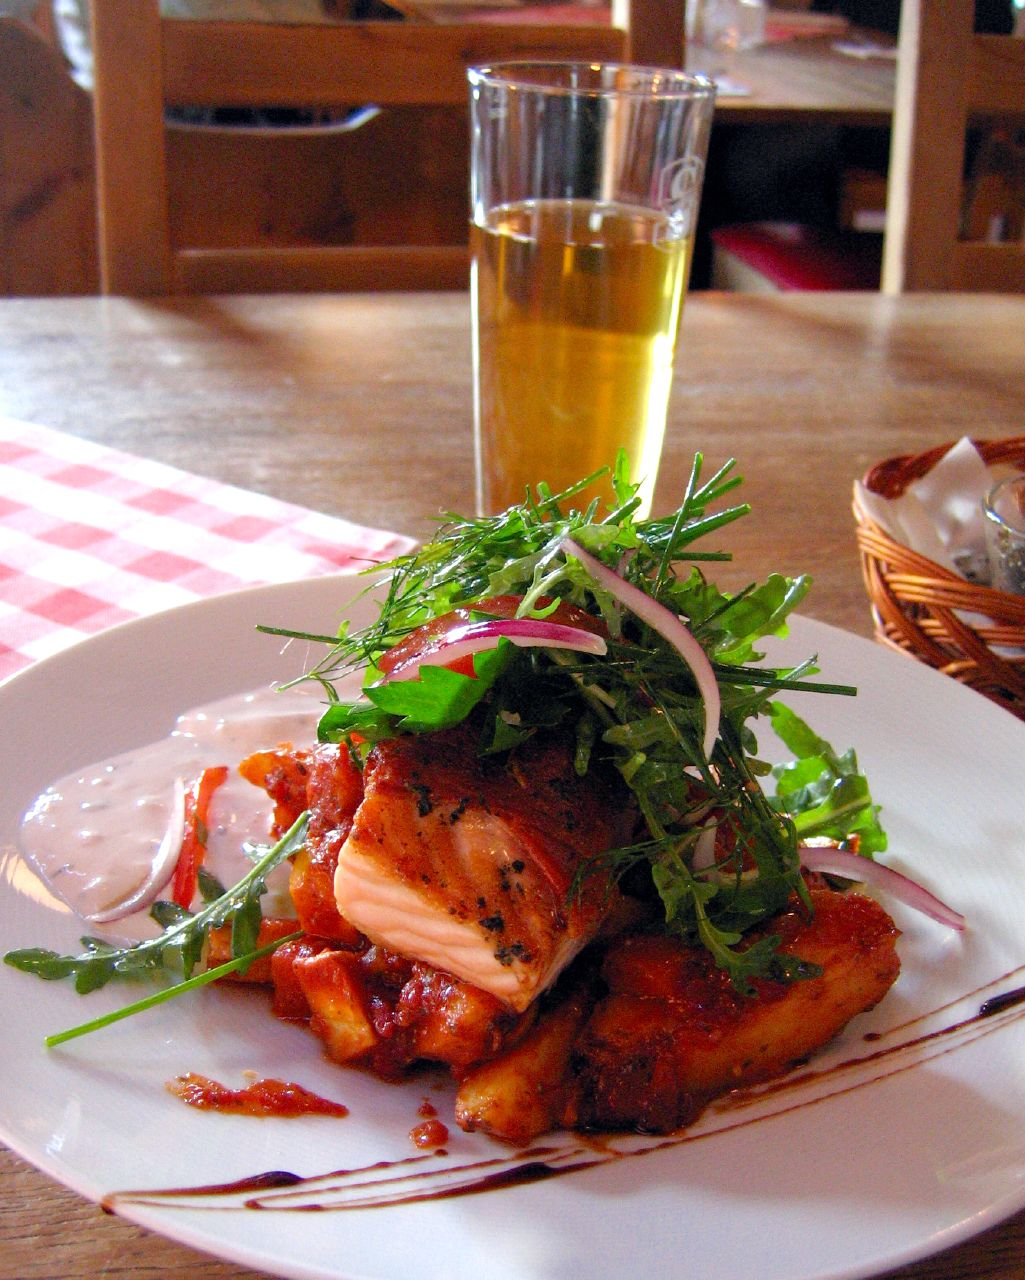 Beskrivning Swedish.food-Grillad.parmaskinks-inlindad.laxrygg-01.jpg